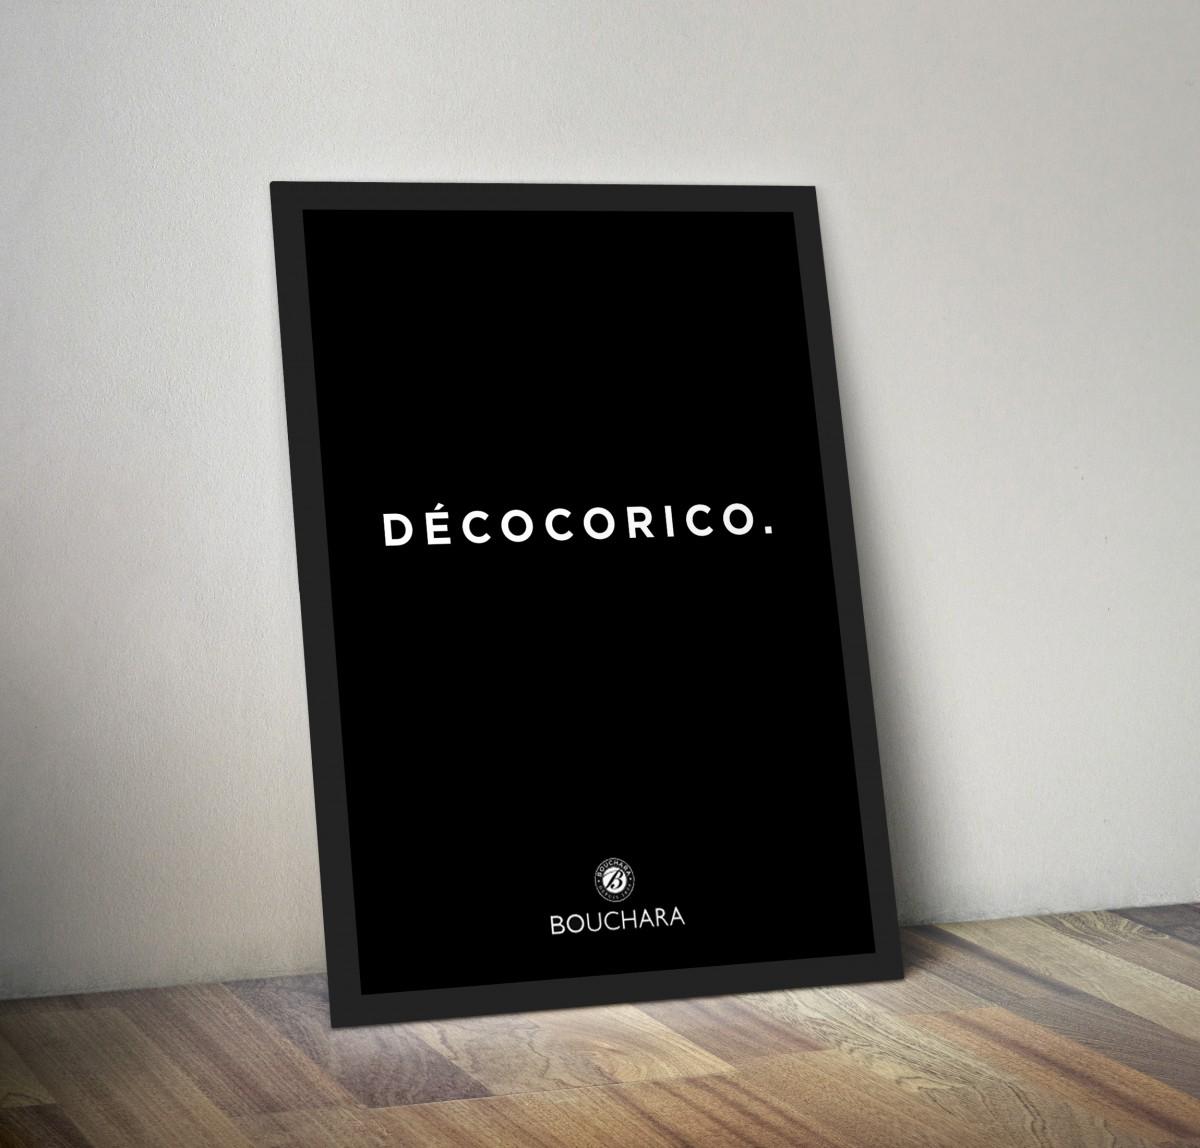 Bouchara_verygoodchoice_poster decocorico